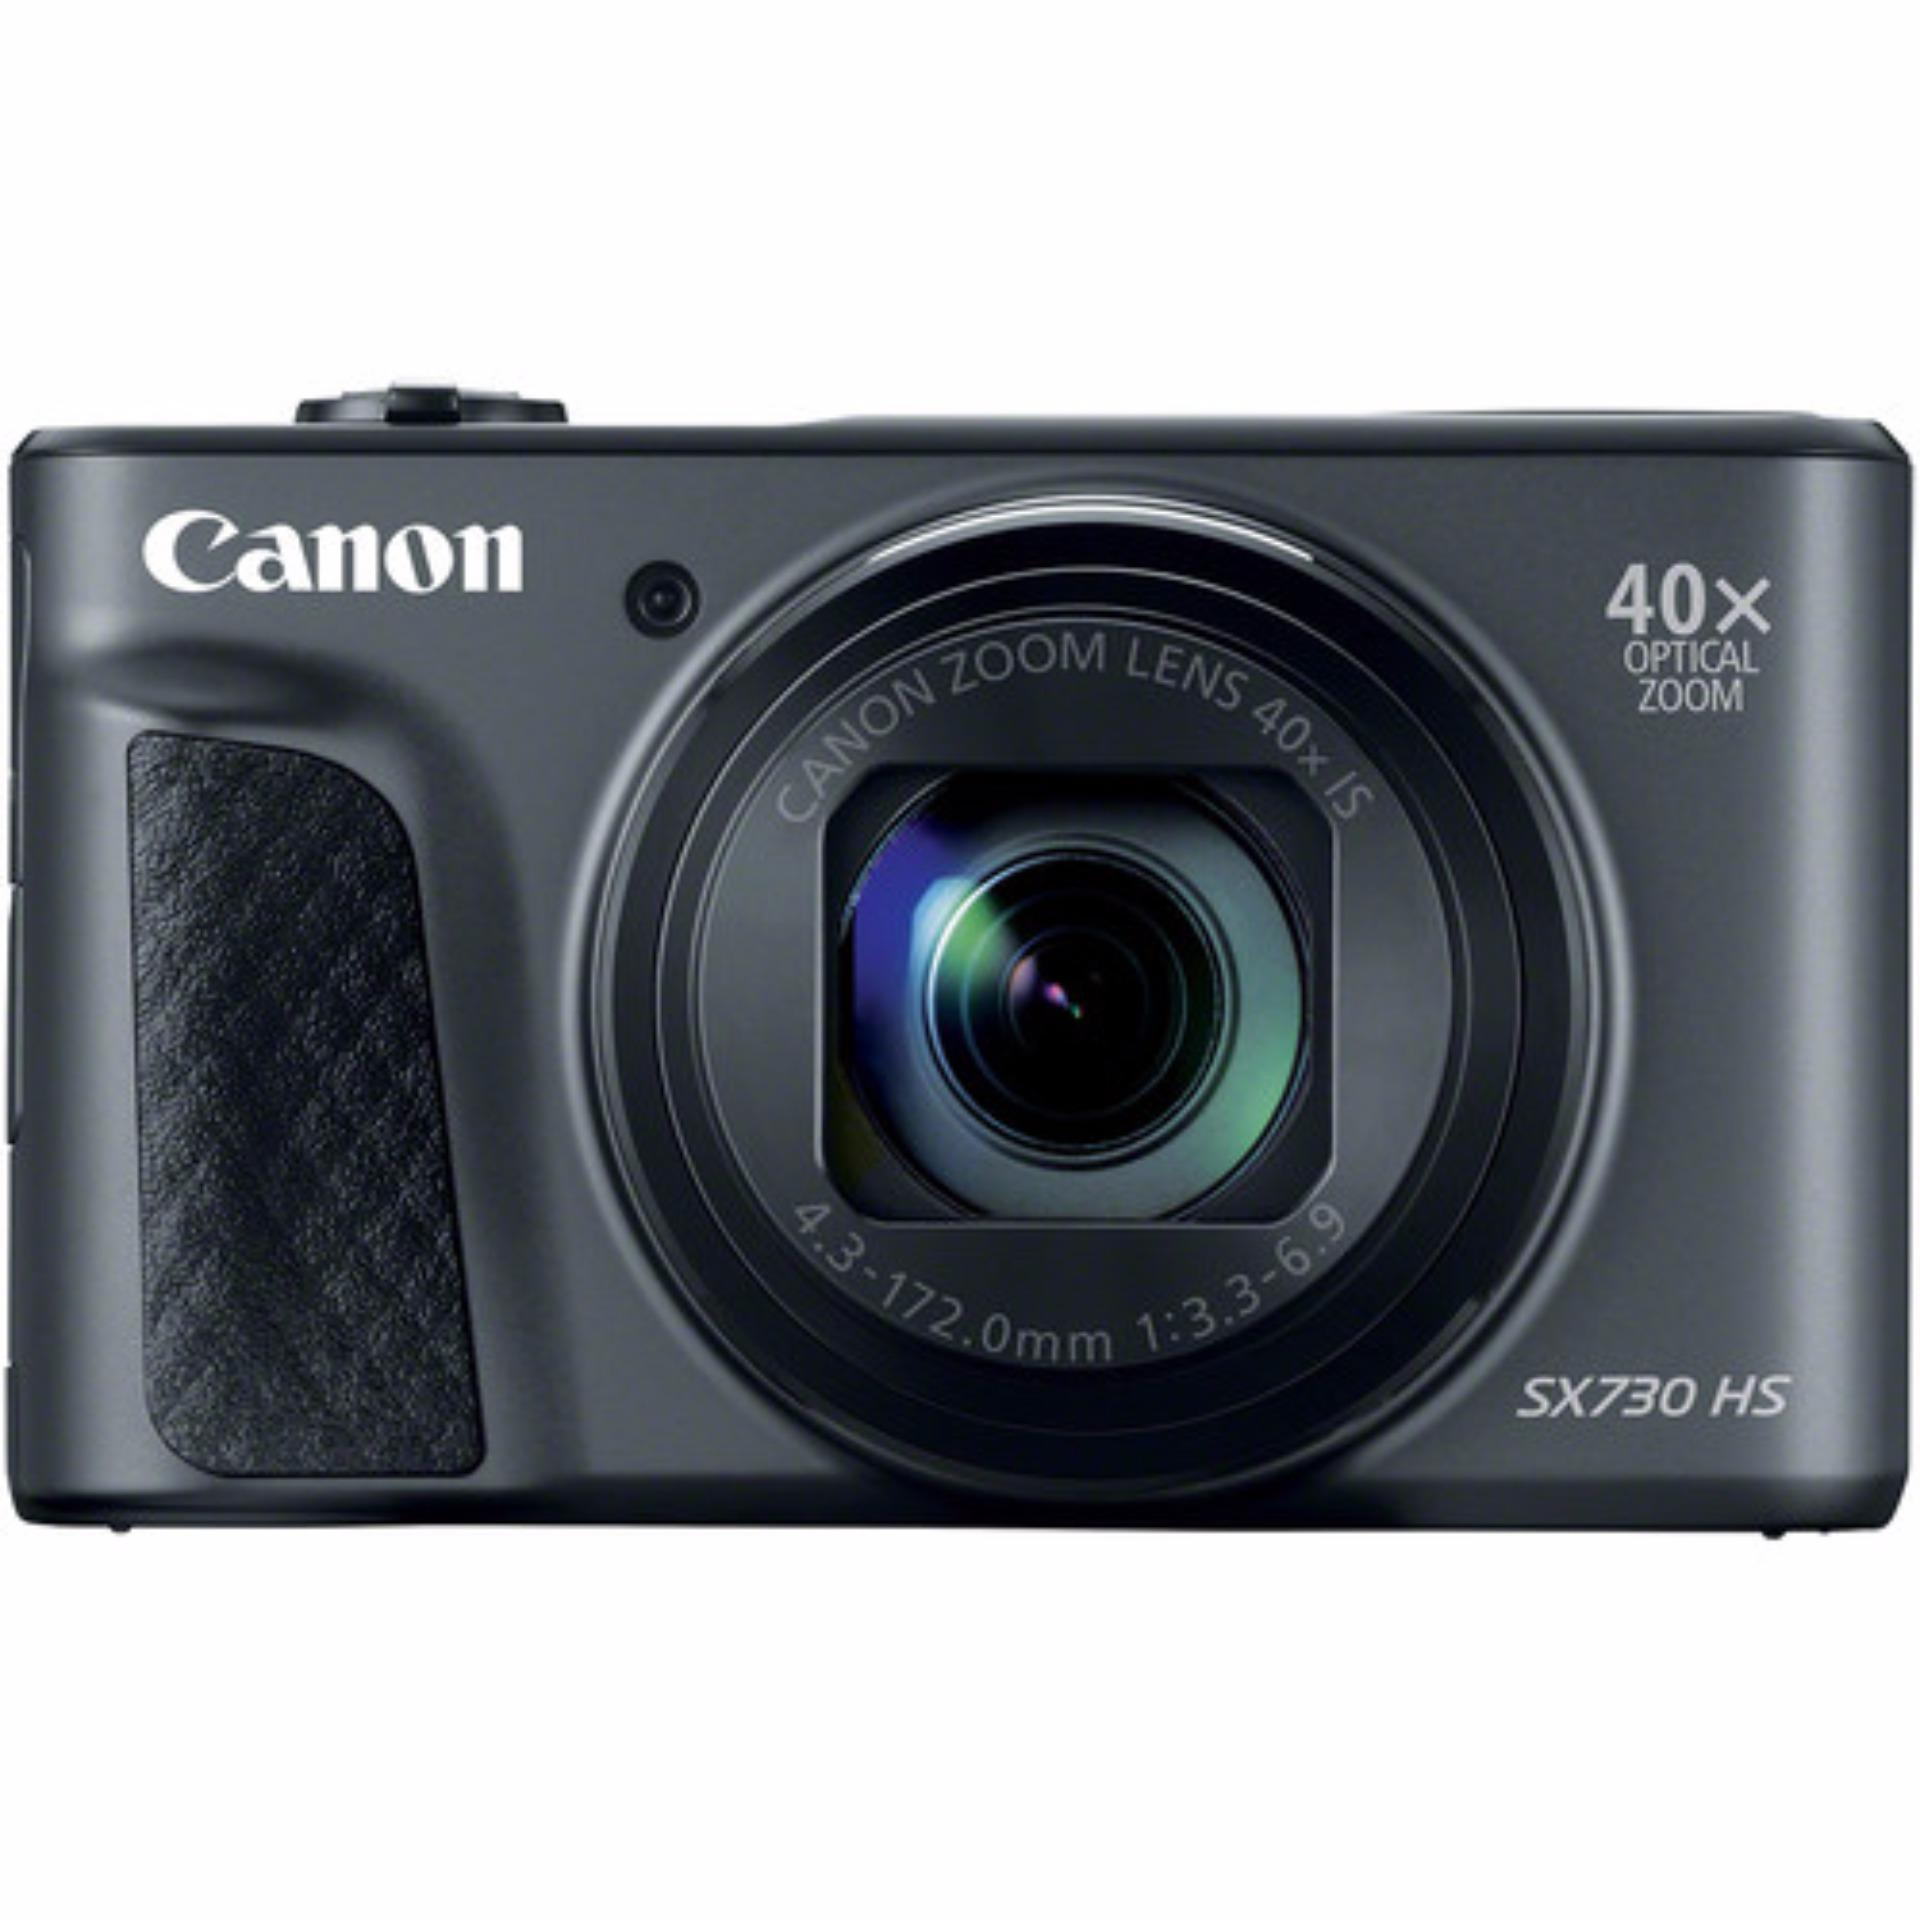 (Special Price) Canon Powershot SX730HS Digital Camera (Black) (2 x 16GB SD Card, 1 x Screen Protector)